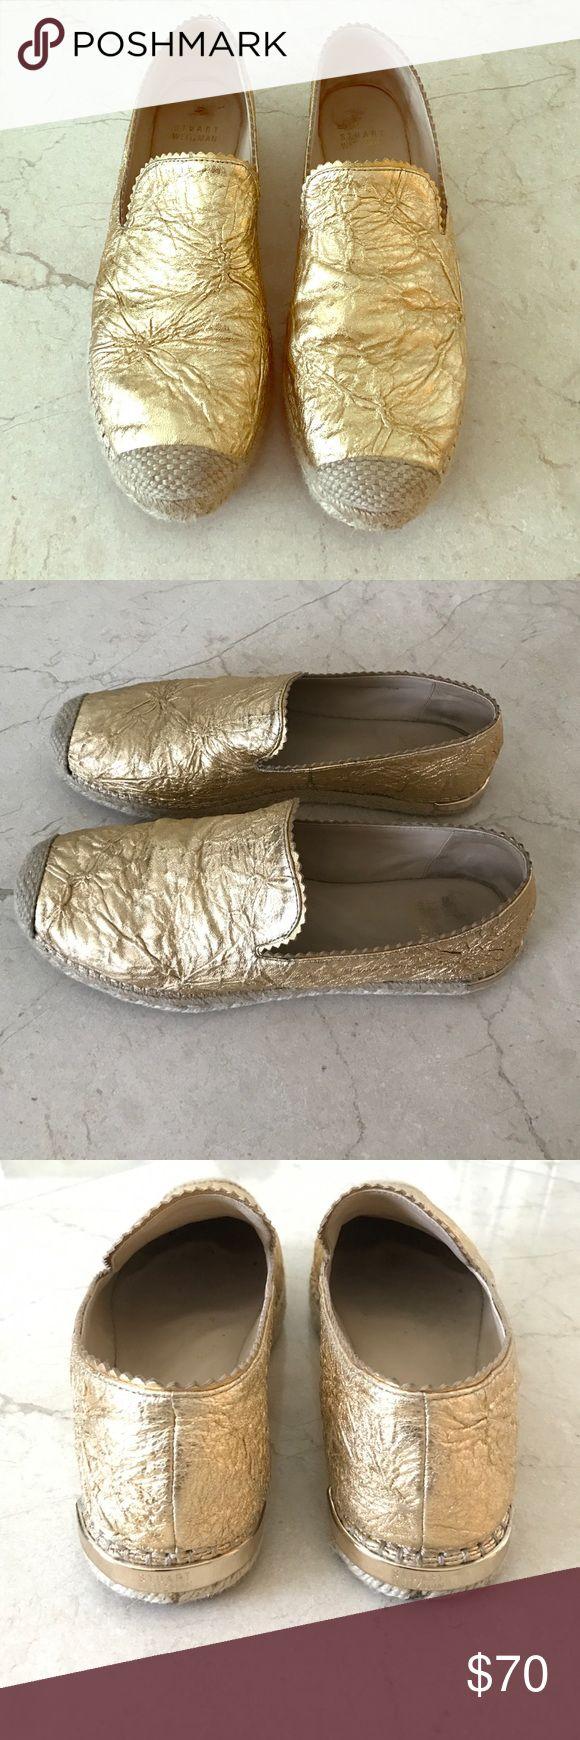 Stuart Weitzman gold espadrilles size 8.5 Stuart Weitzman gold espadrille size 8.5 Stuart Weitzman Shoes Espadrilles